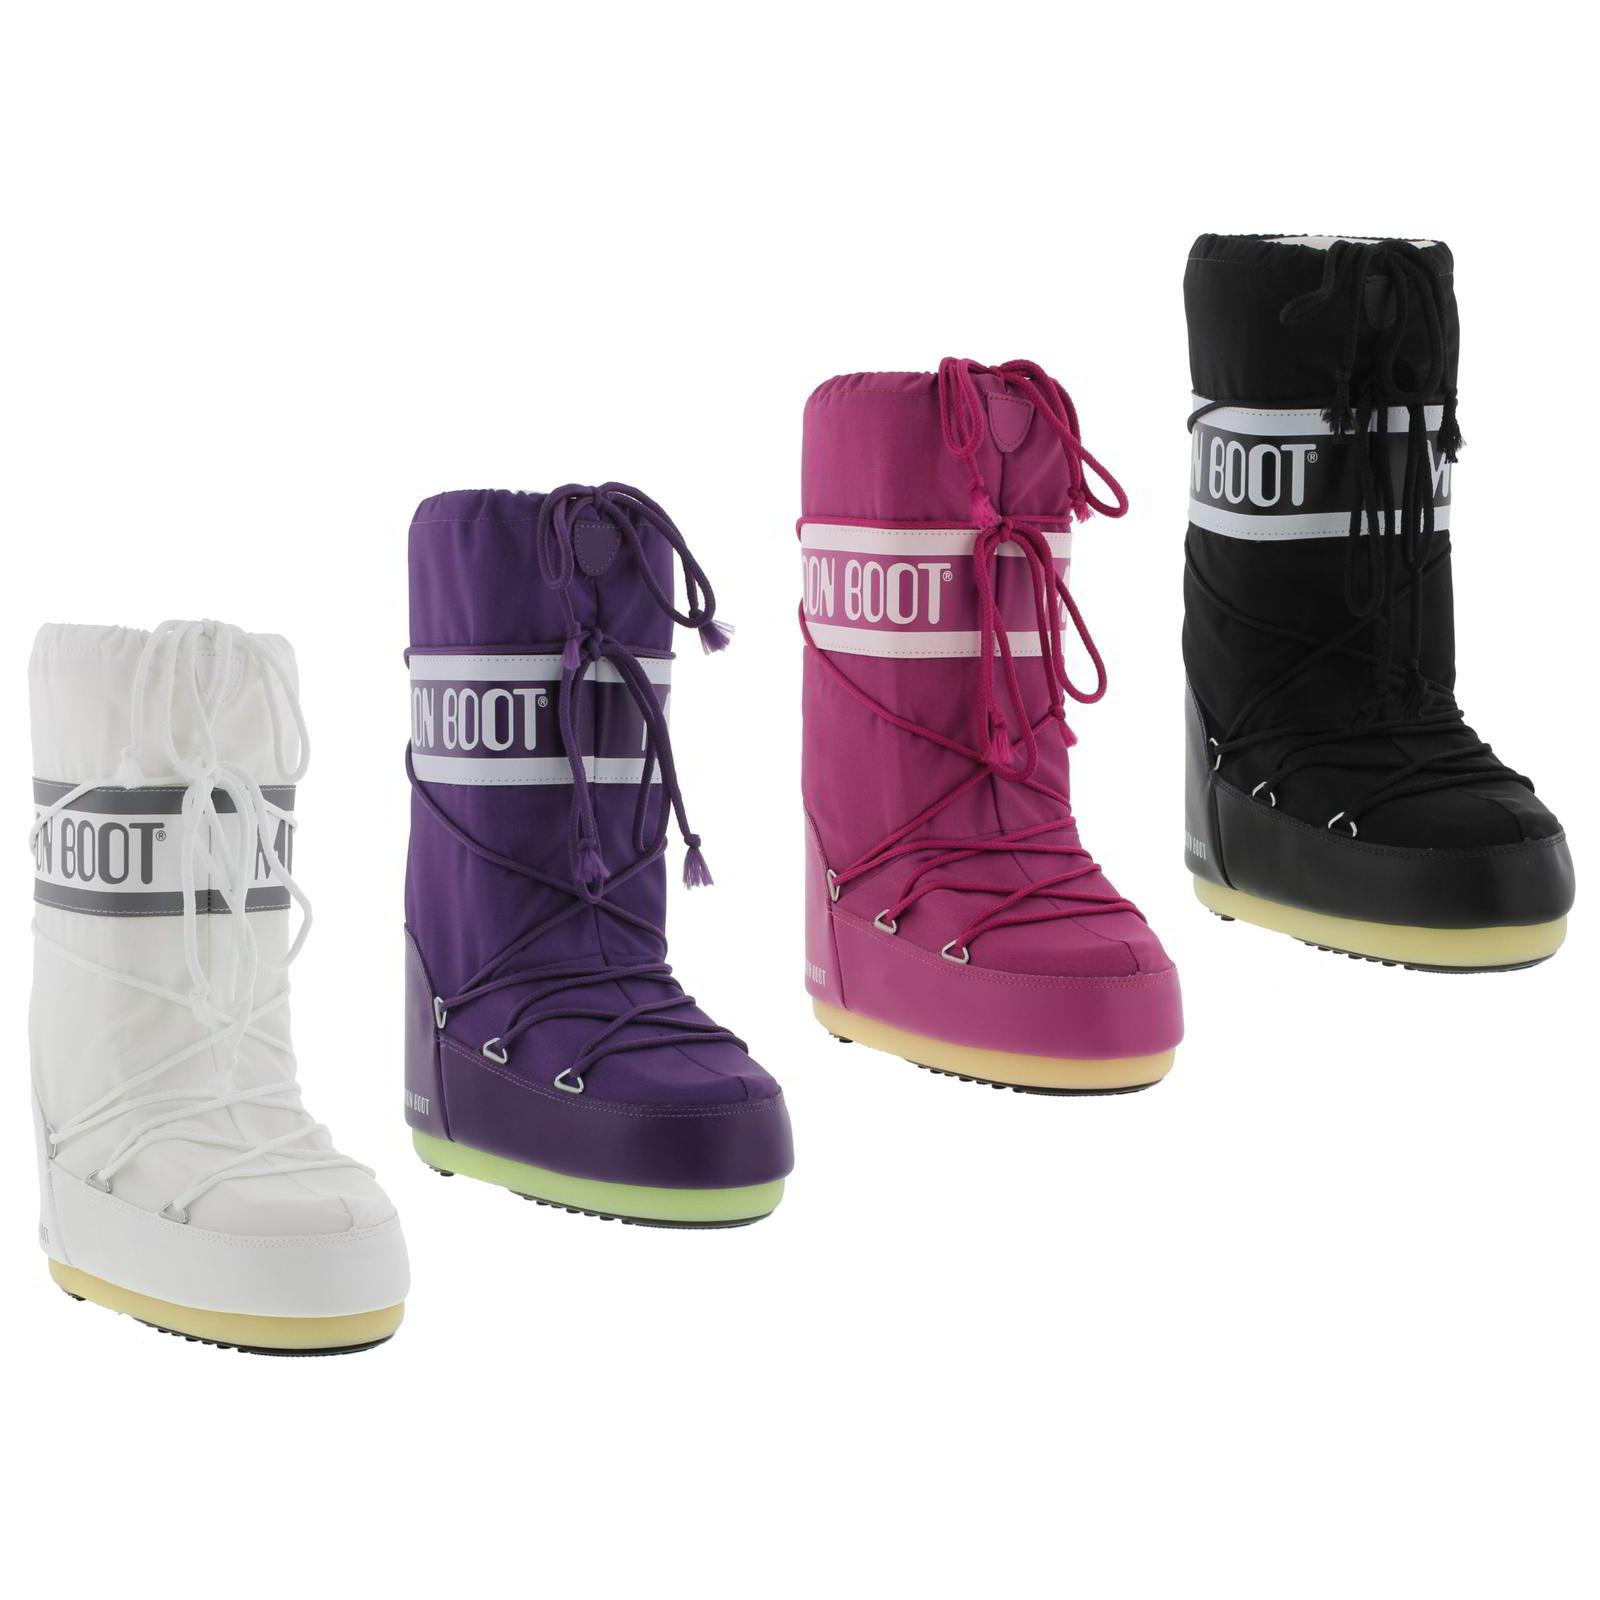 tecnica moon boots womens black white pink purple